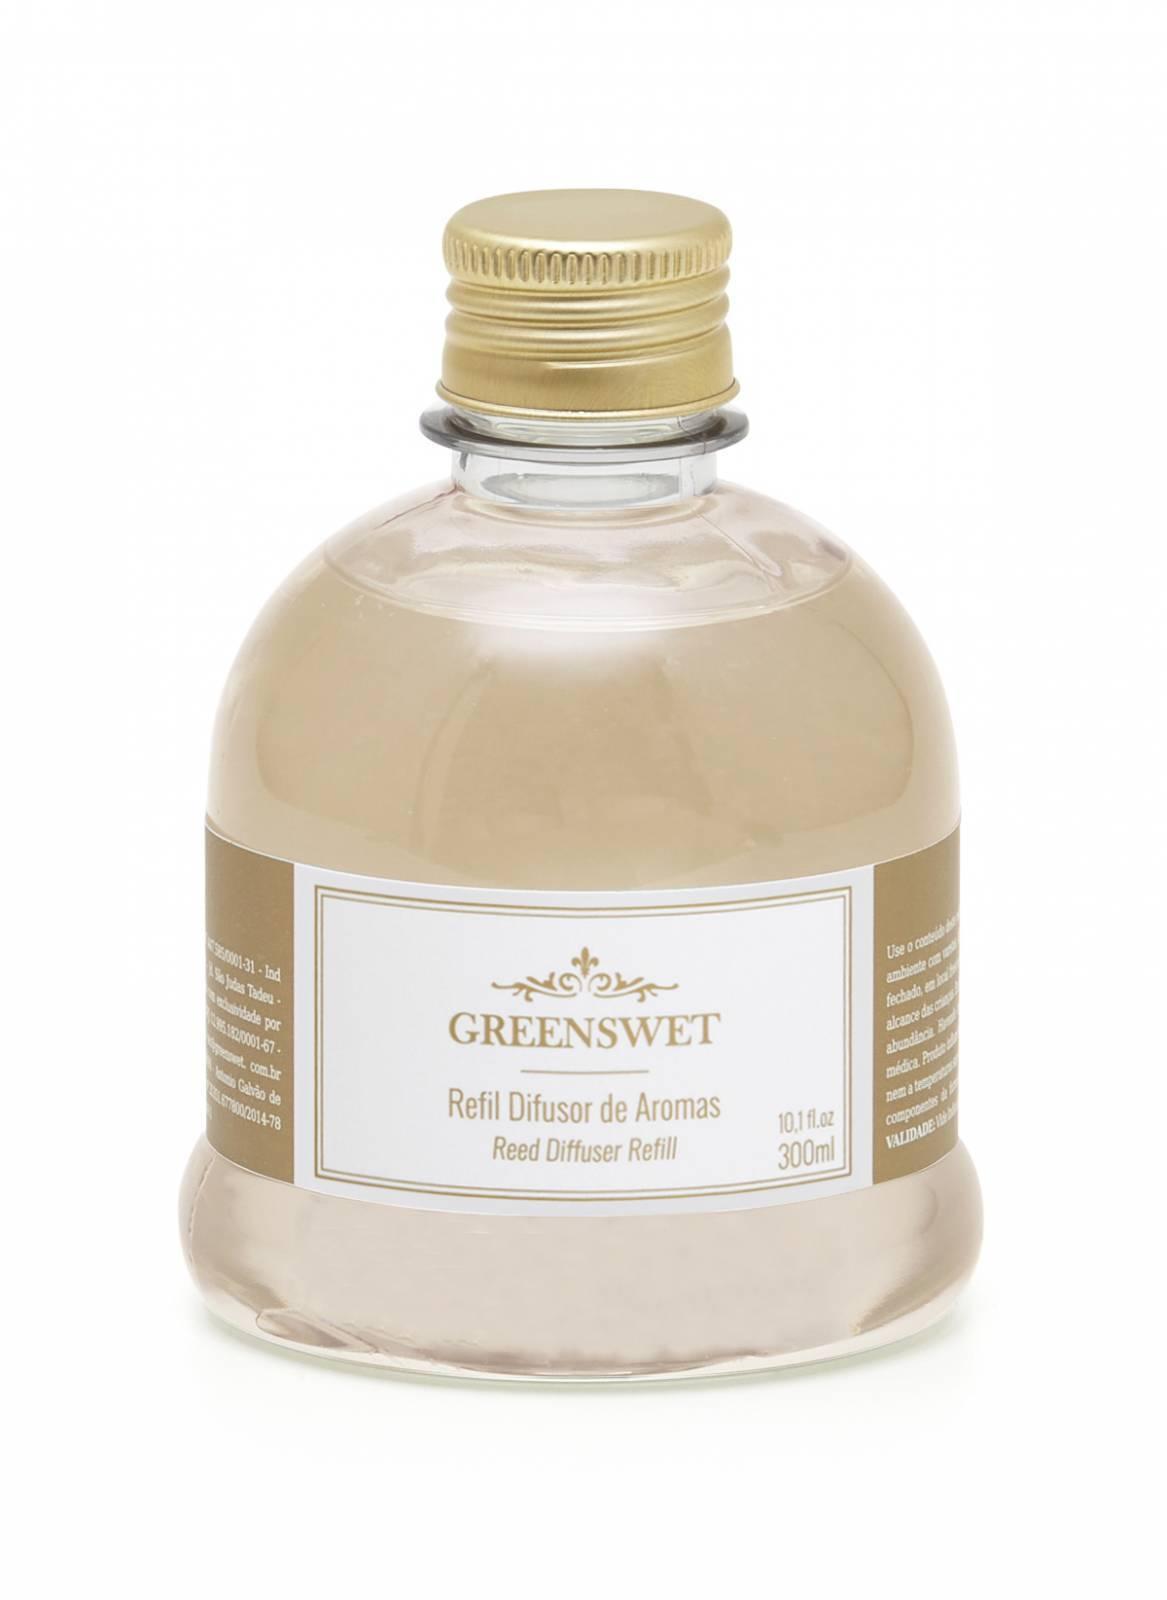 Refil Difusor de Aromas 300ml Essência Vanilla - Greenswet Aromatizantes